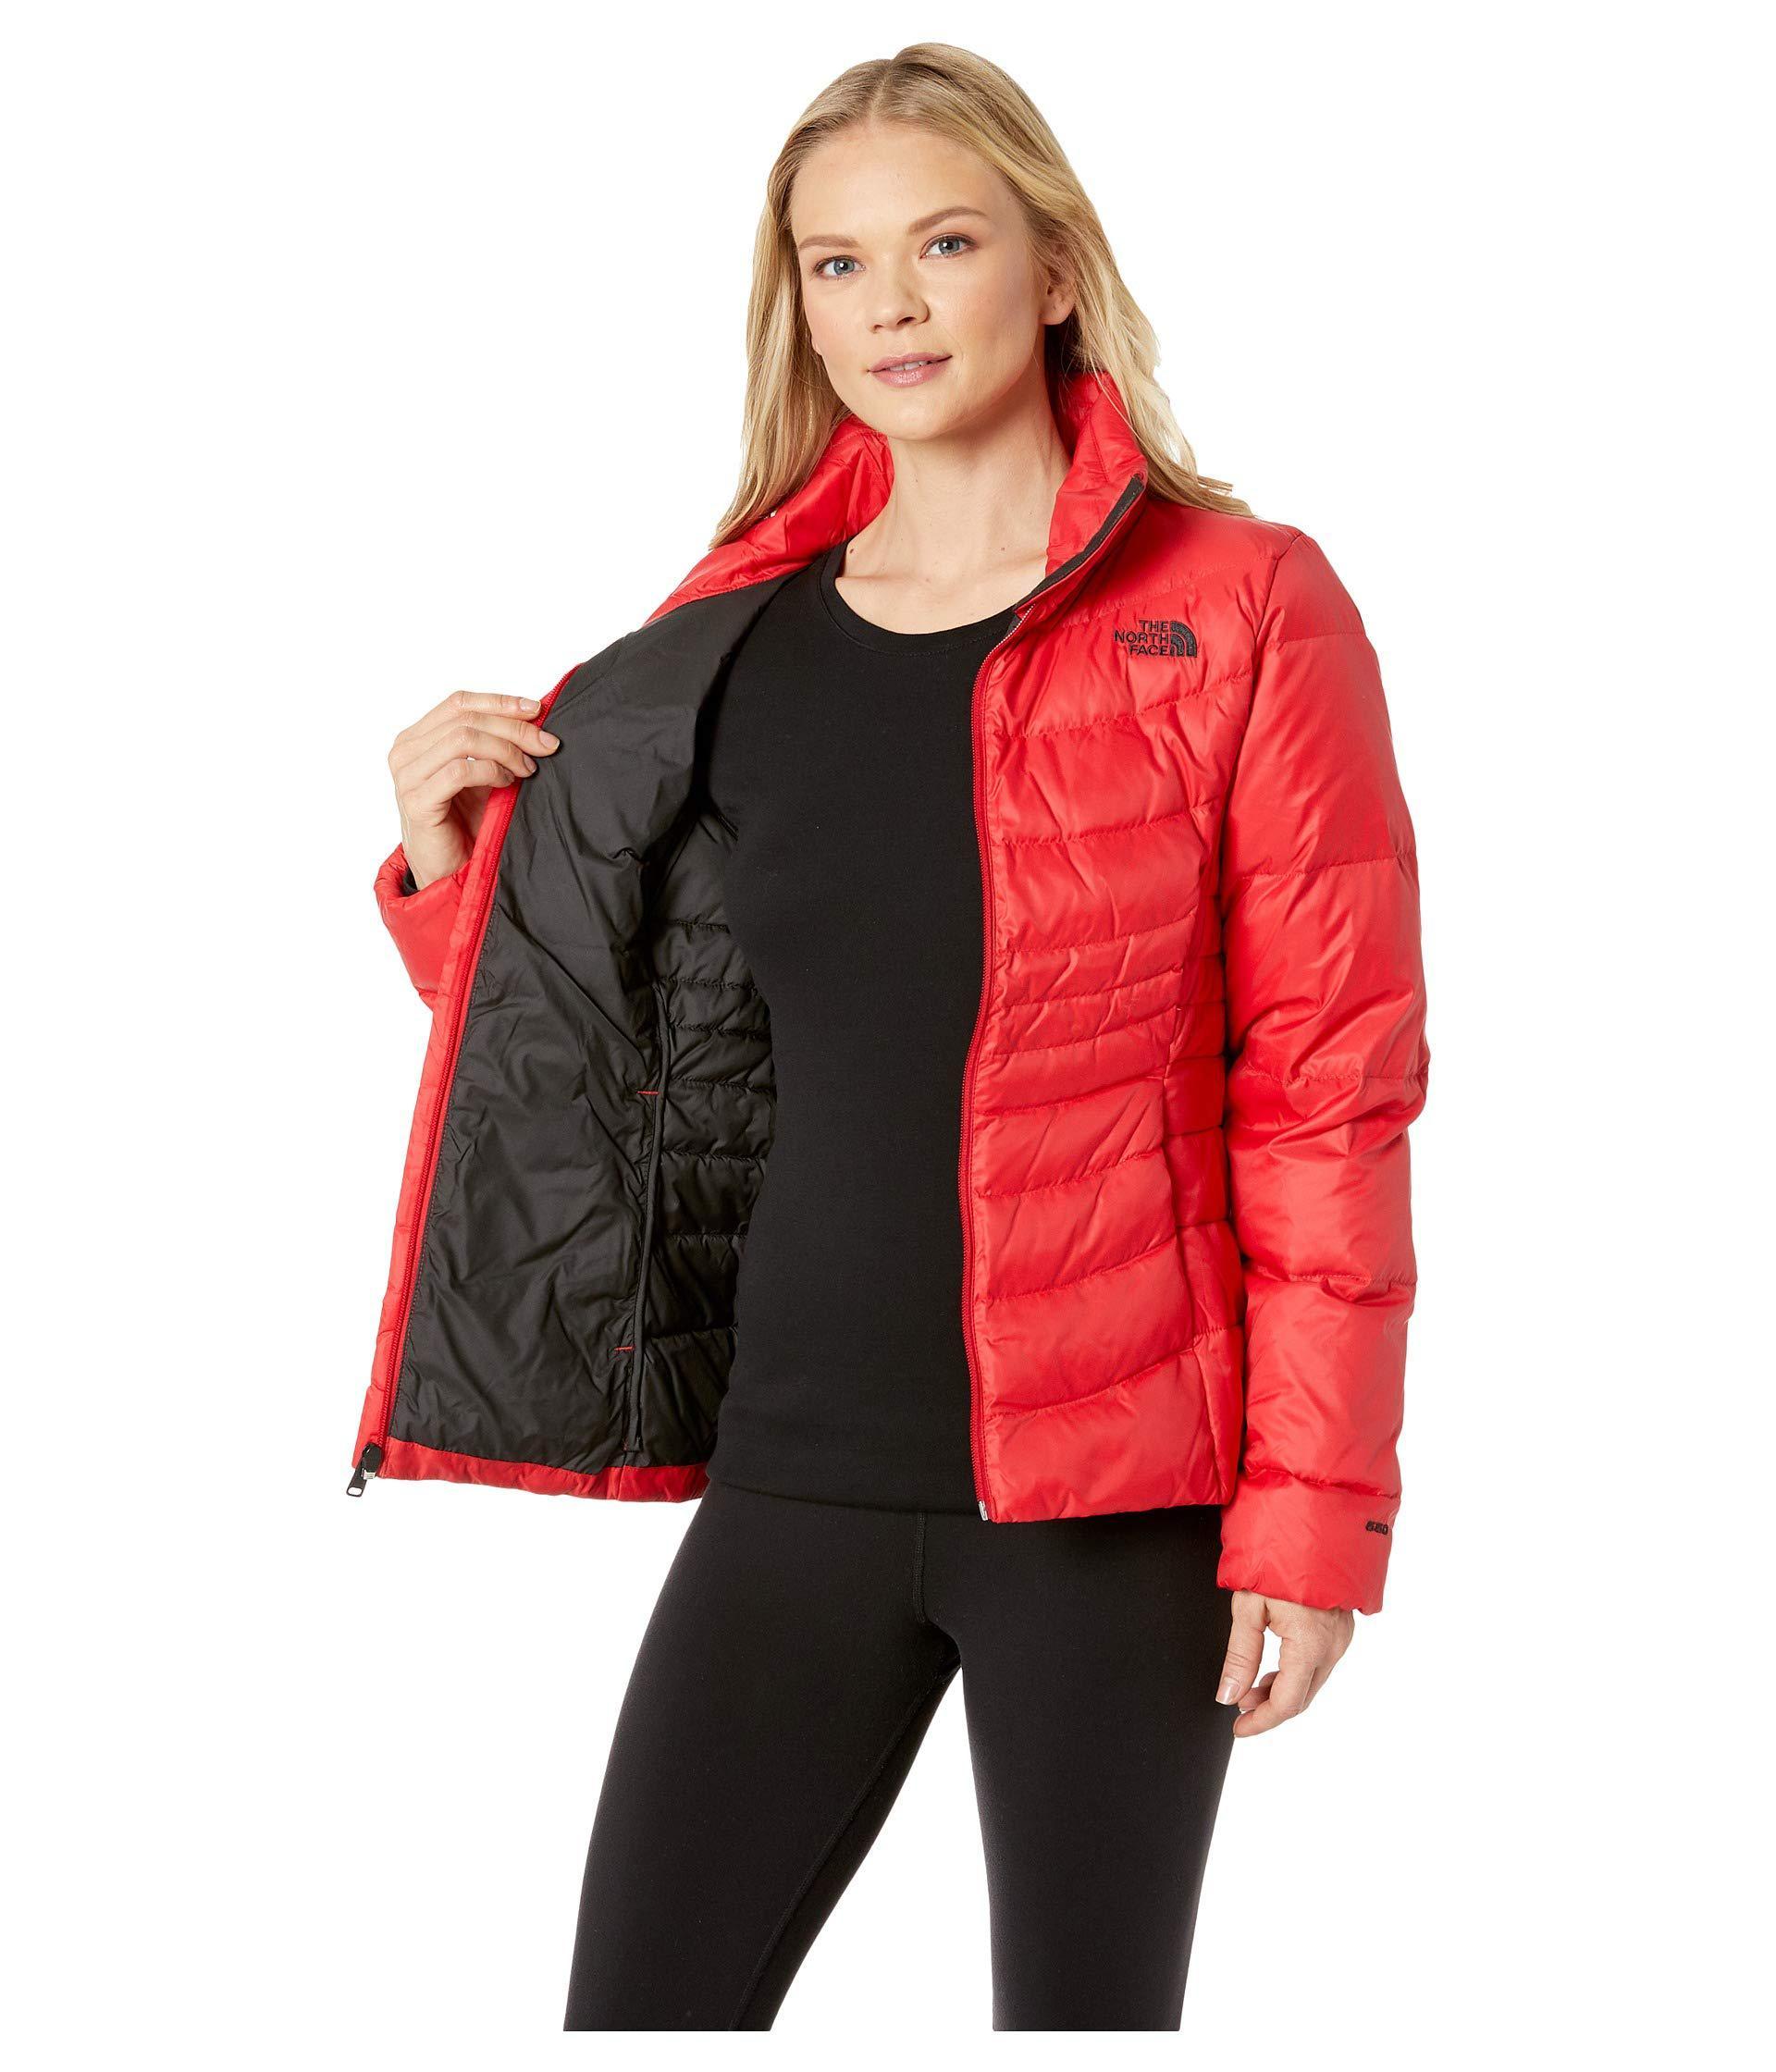 ebef30f87ec72 The North Face - Red Aconcagua Jacket Ii (shiny Mid Grey) Women s Coat -.  View fullscreen